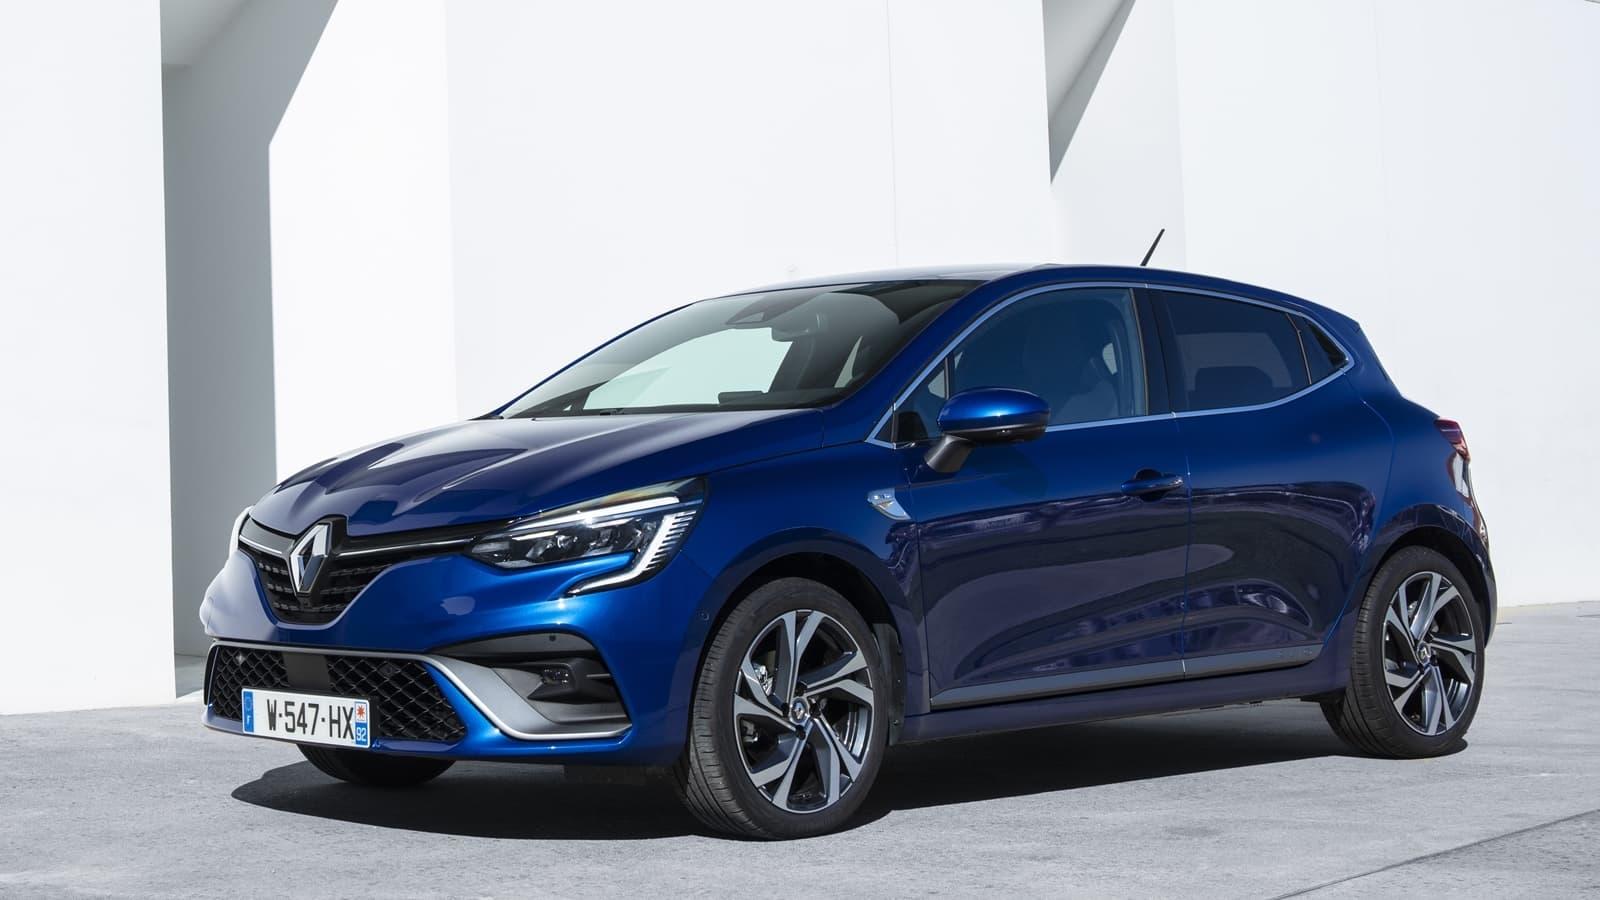 Renault Clio 2020 Prueba 0619 035